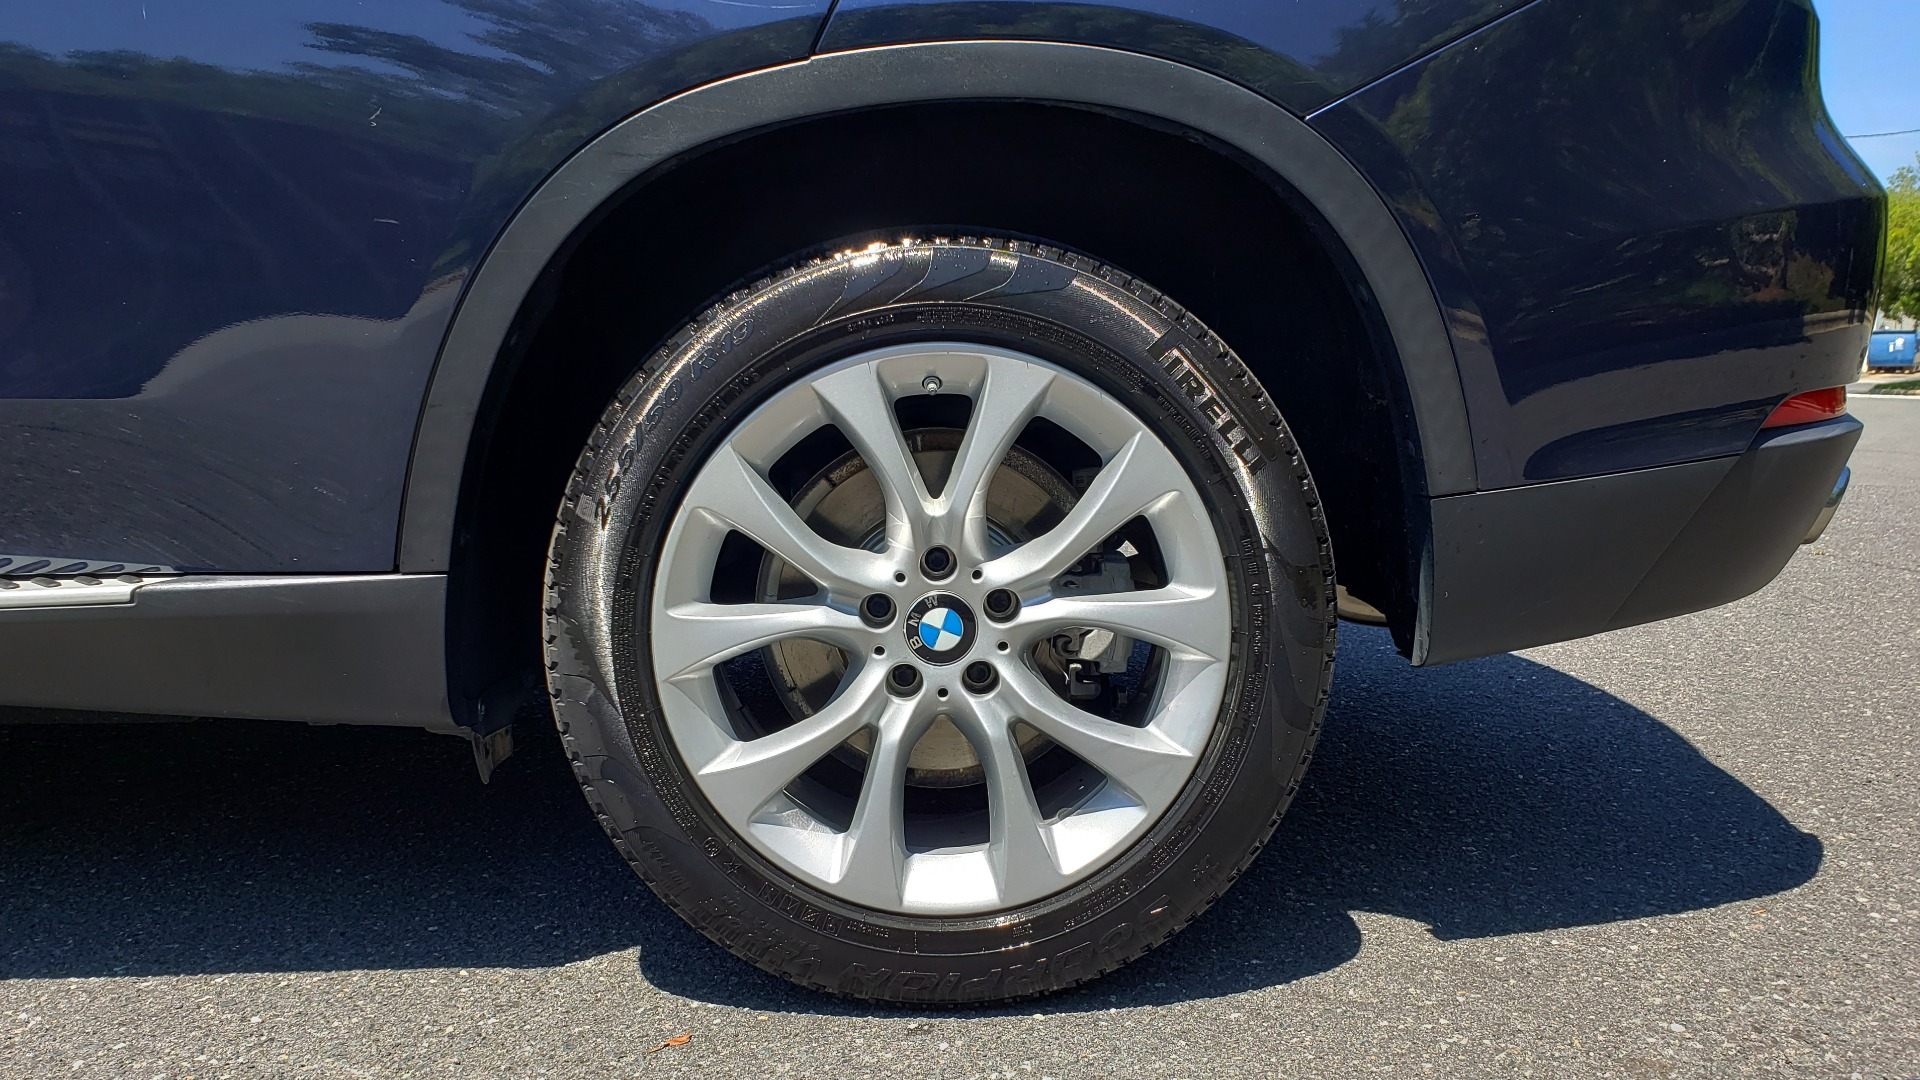 Used 2016 BMW X5 XDRIVE35I / PREM PKG / NAV / DRVR ASST PLUS / REARVIEW for sale $25,765 at Formula Imports in Charlotte NC 28227 64